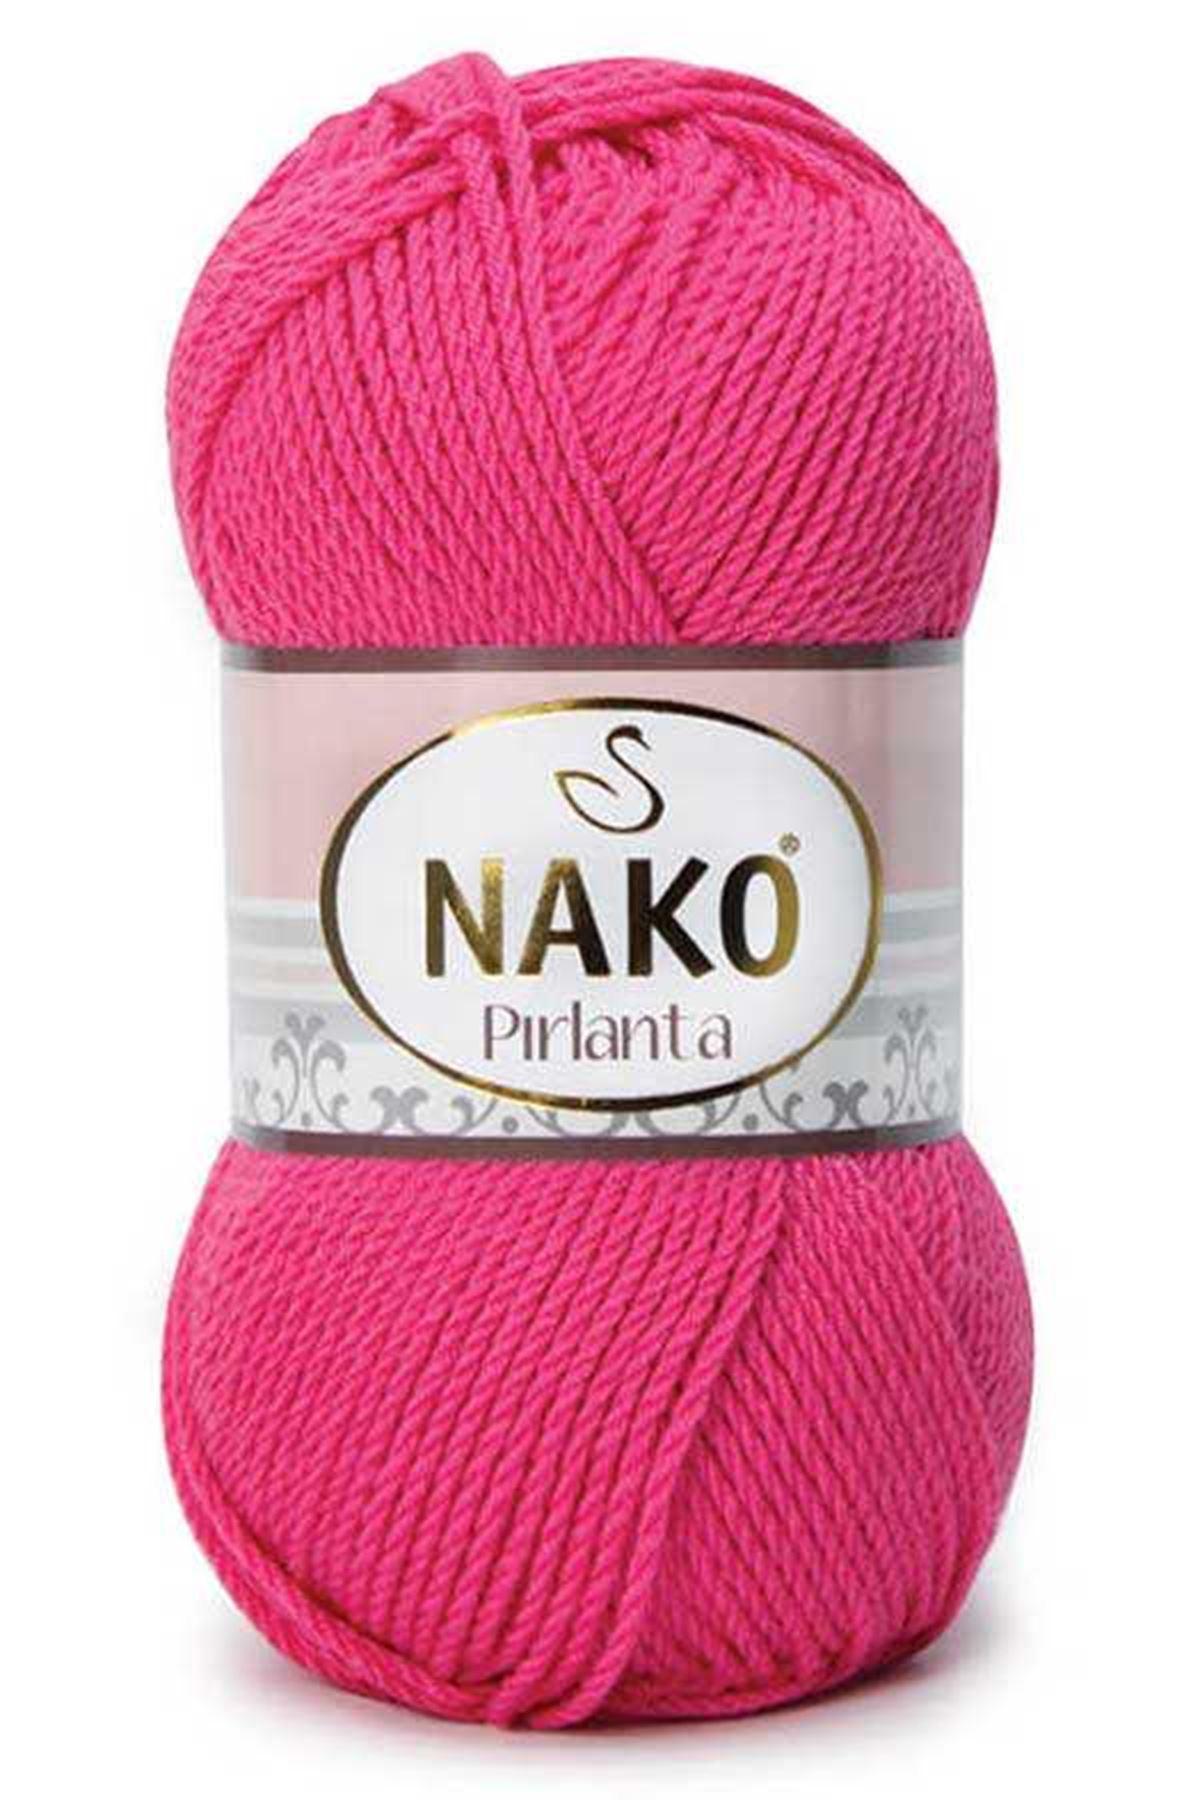 Nako Pırlanta-06737 Fuşya